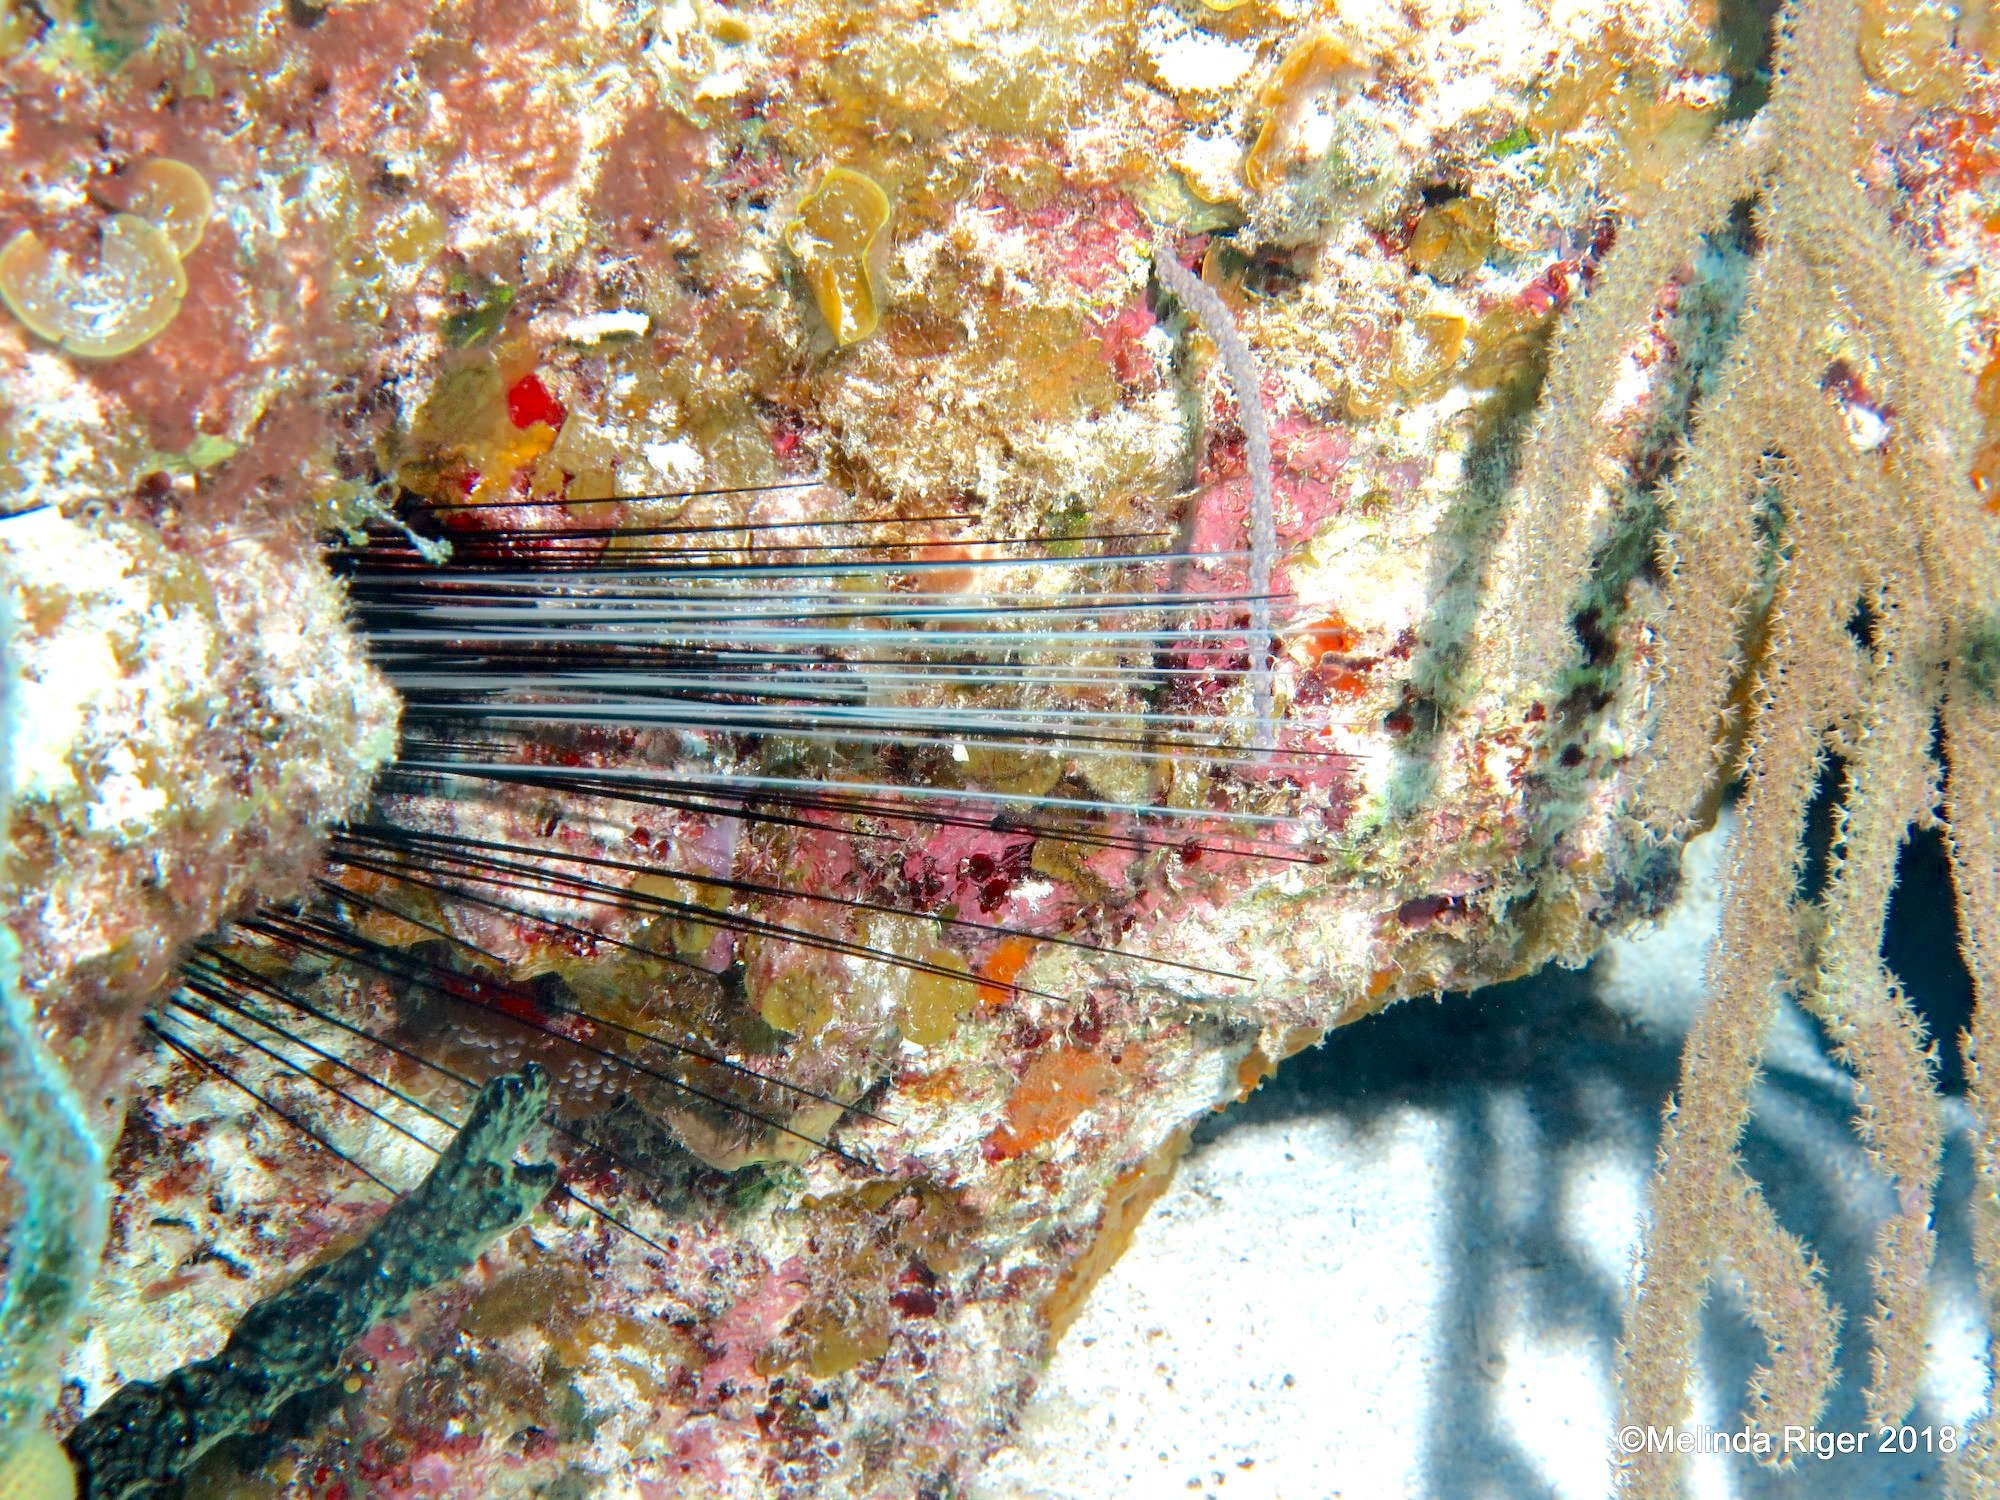 Long-spined sea urchin Diadema antillarum (Melinda Riger / G B Scuba)